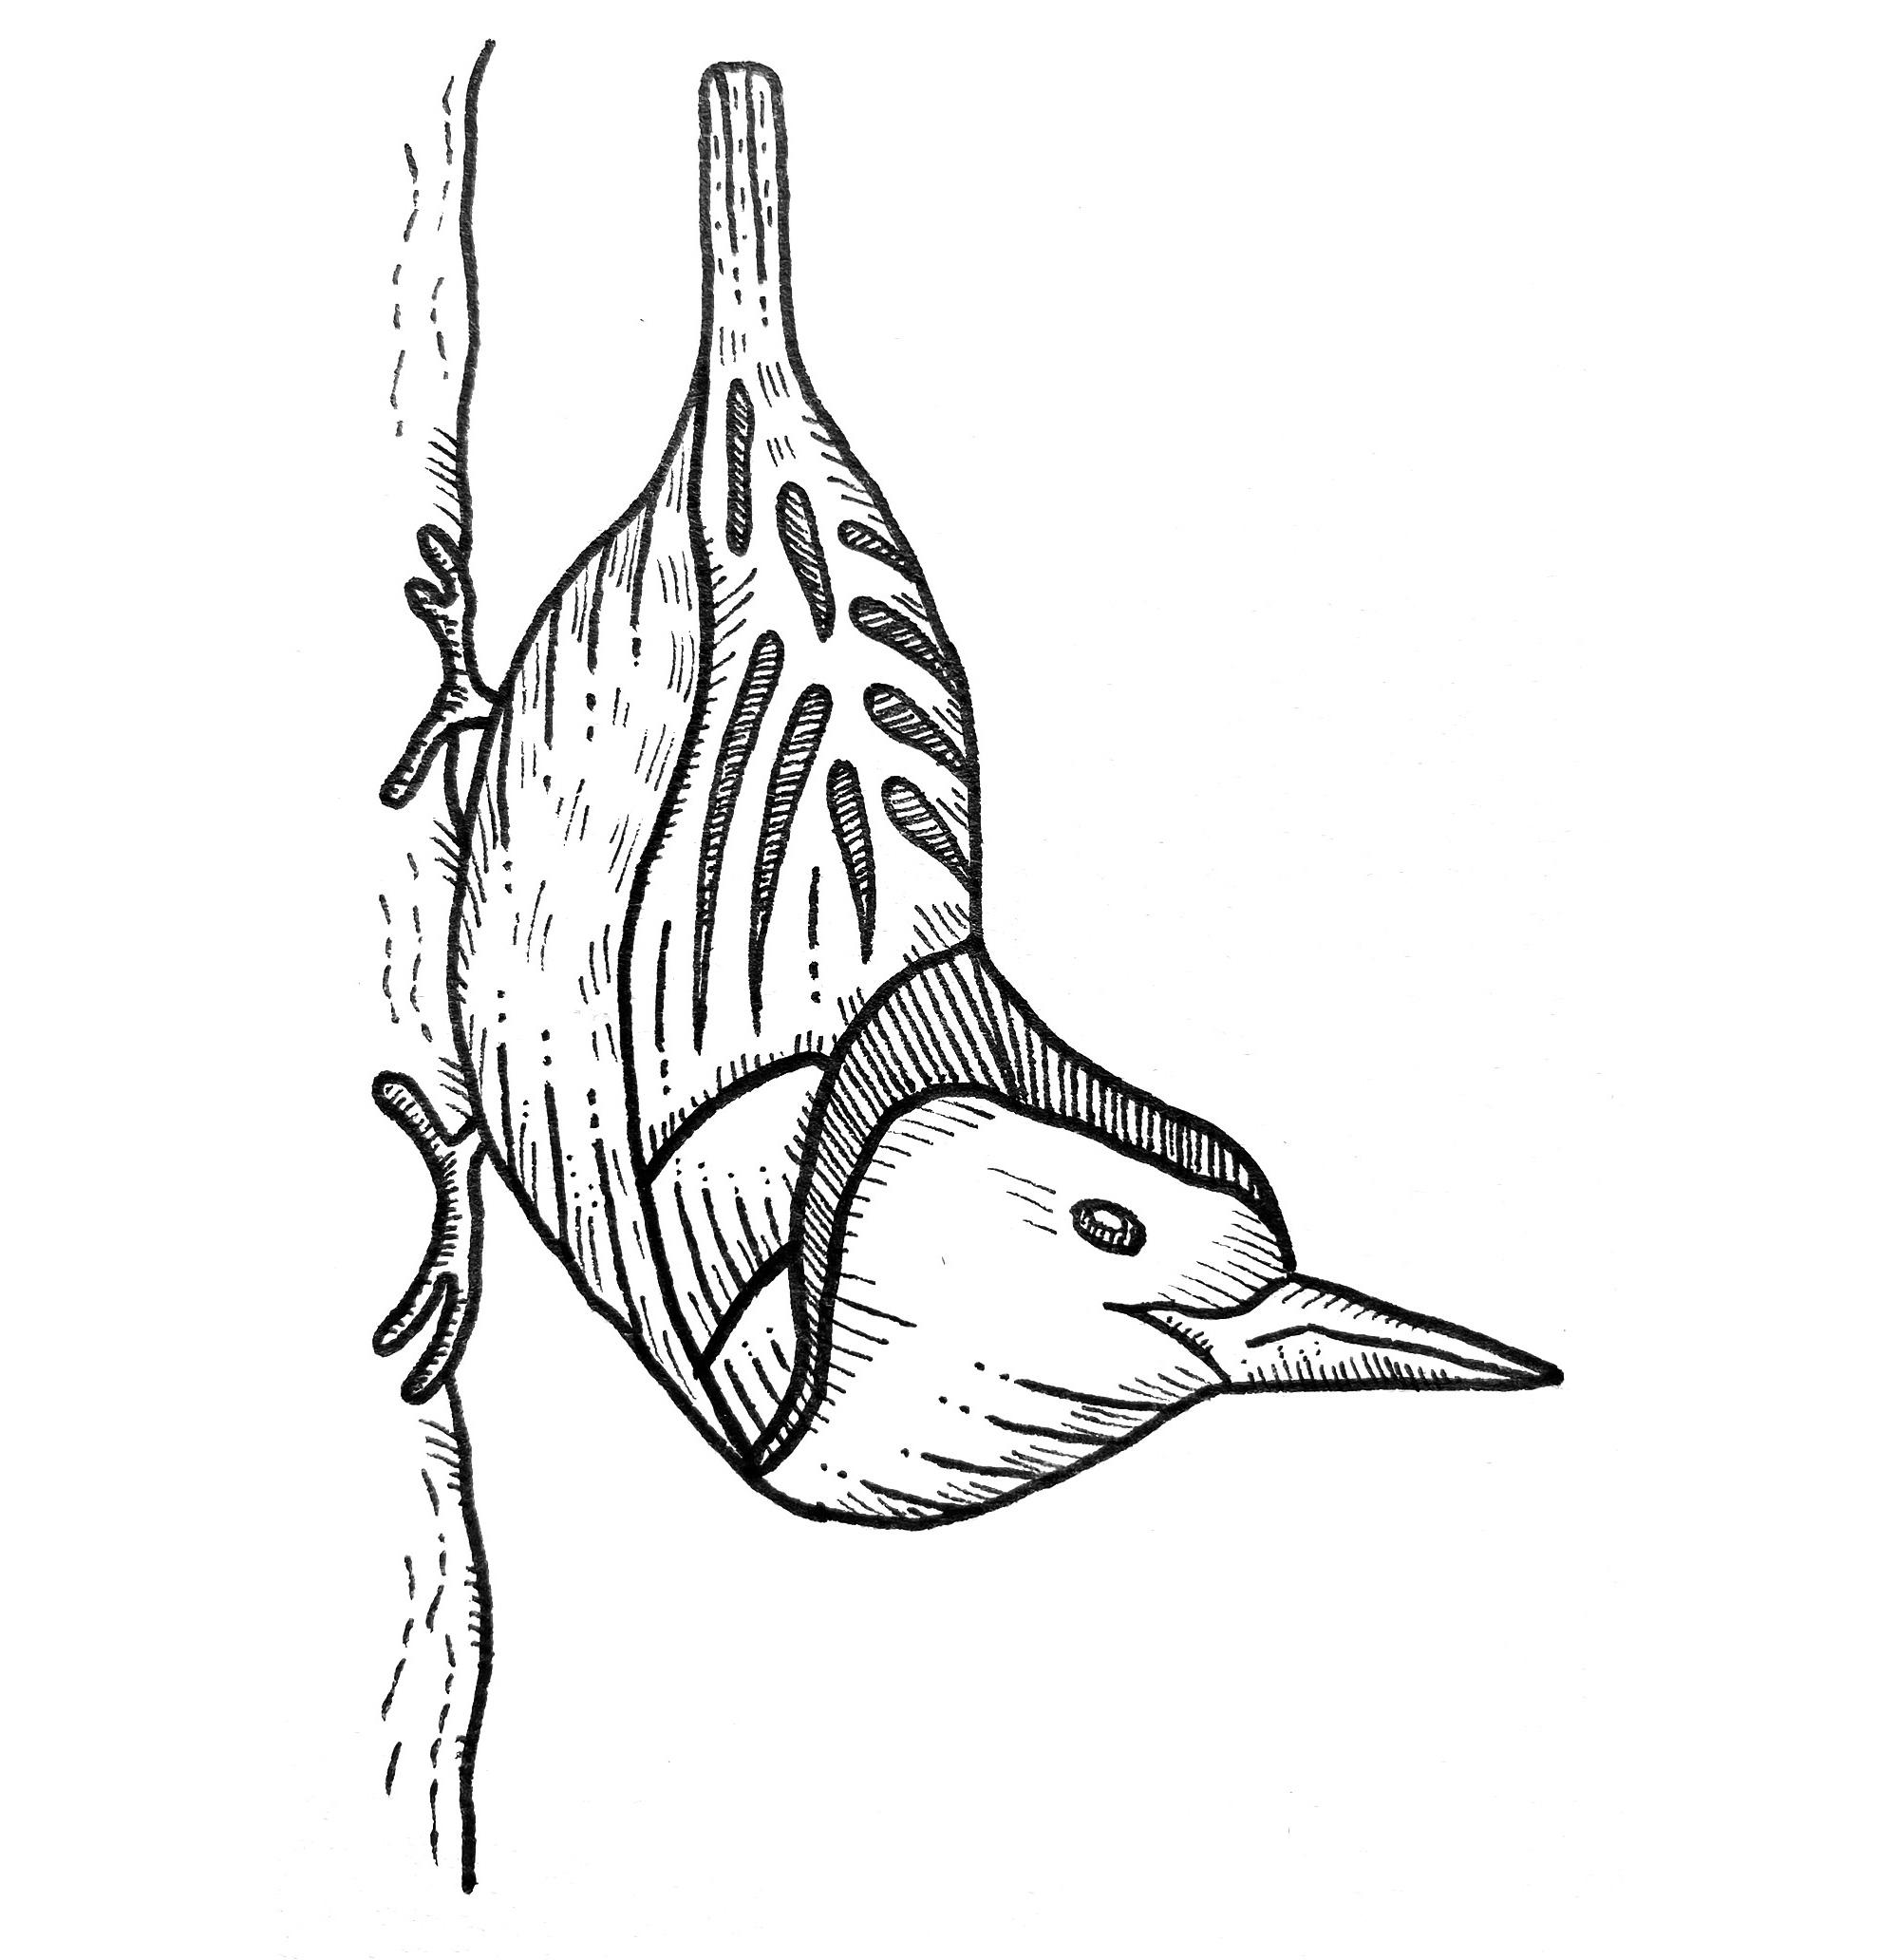 Nuthatch bird drawing